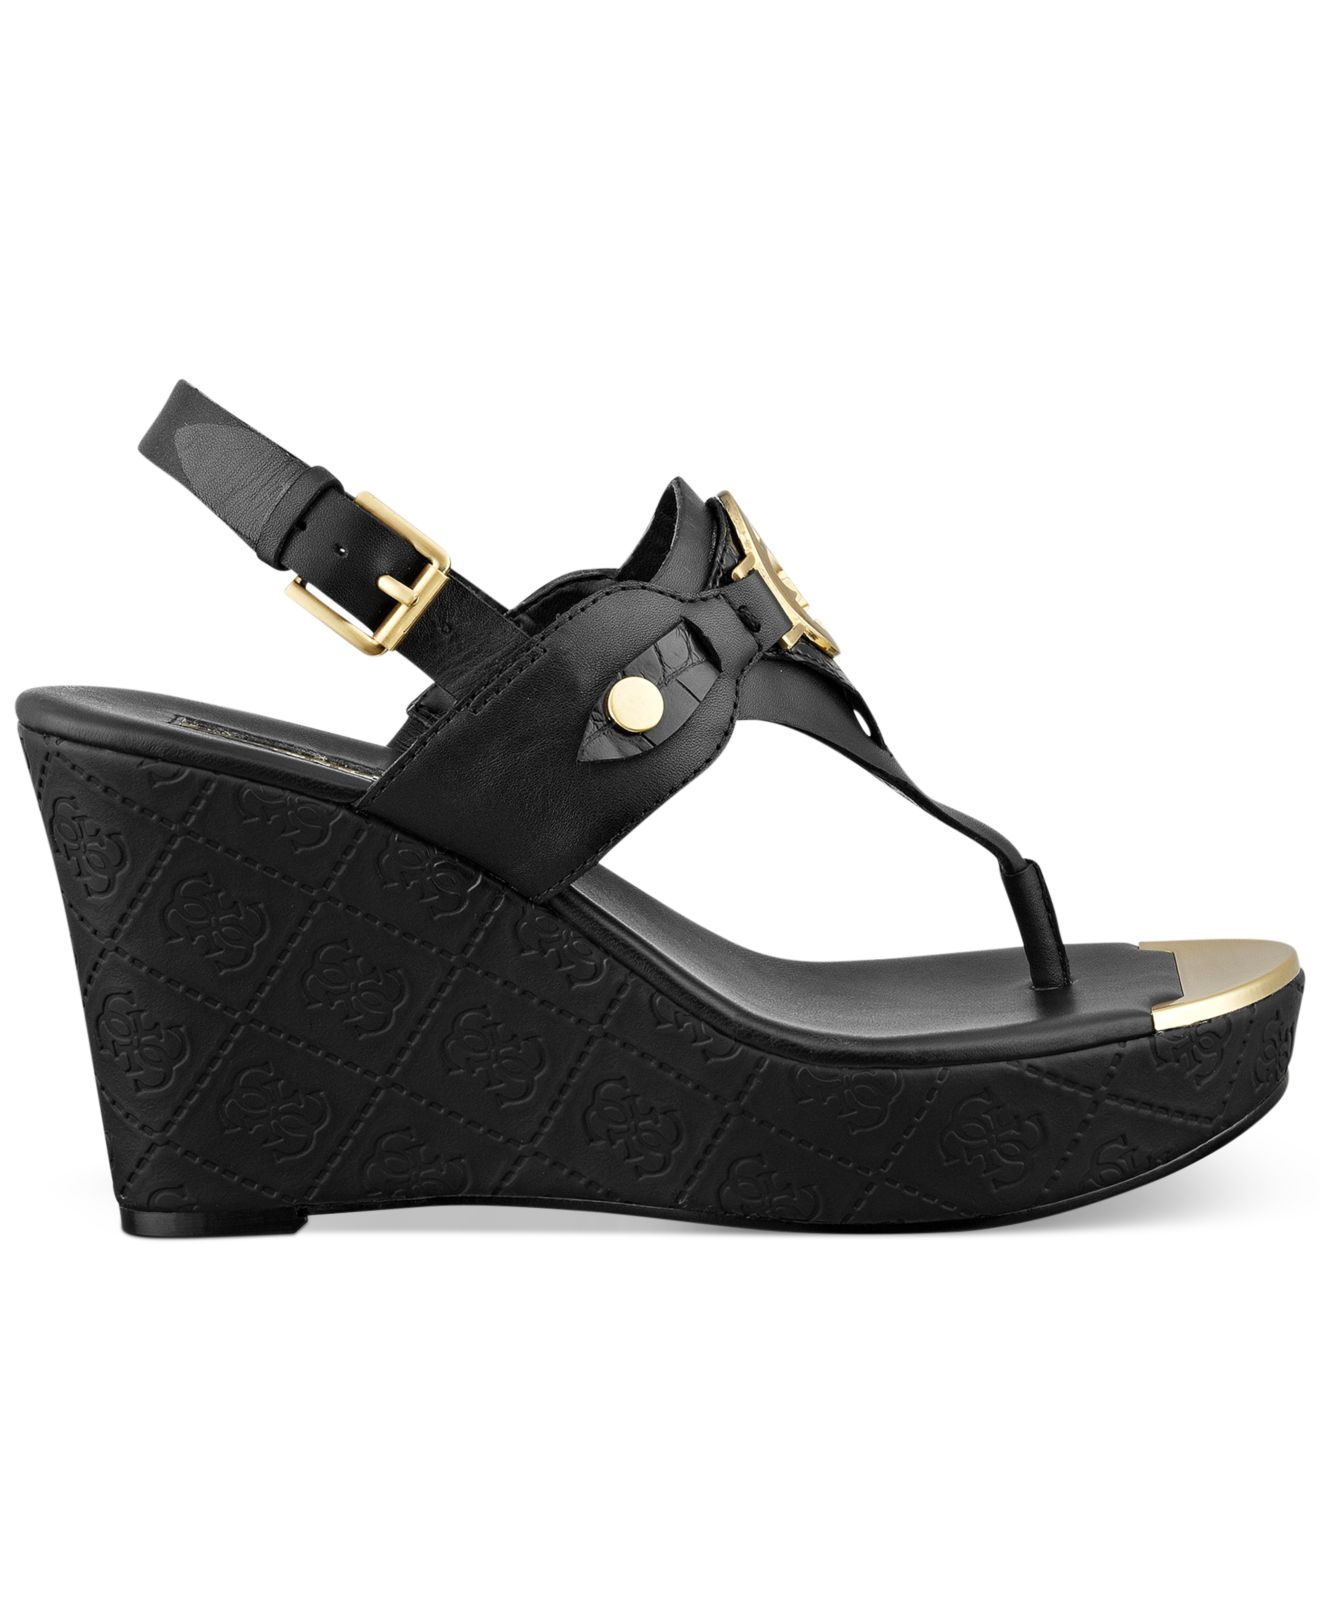 Guess Marcina Platform Wedge Thong Sandals in Black | Lyst